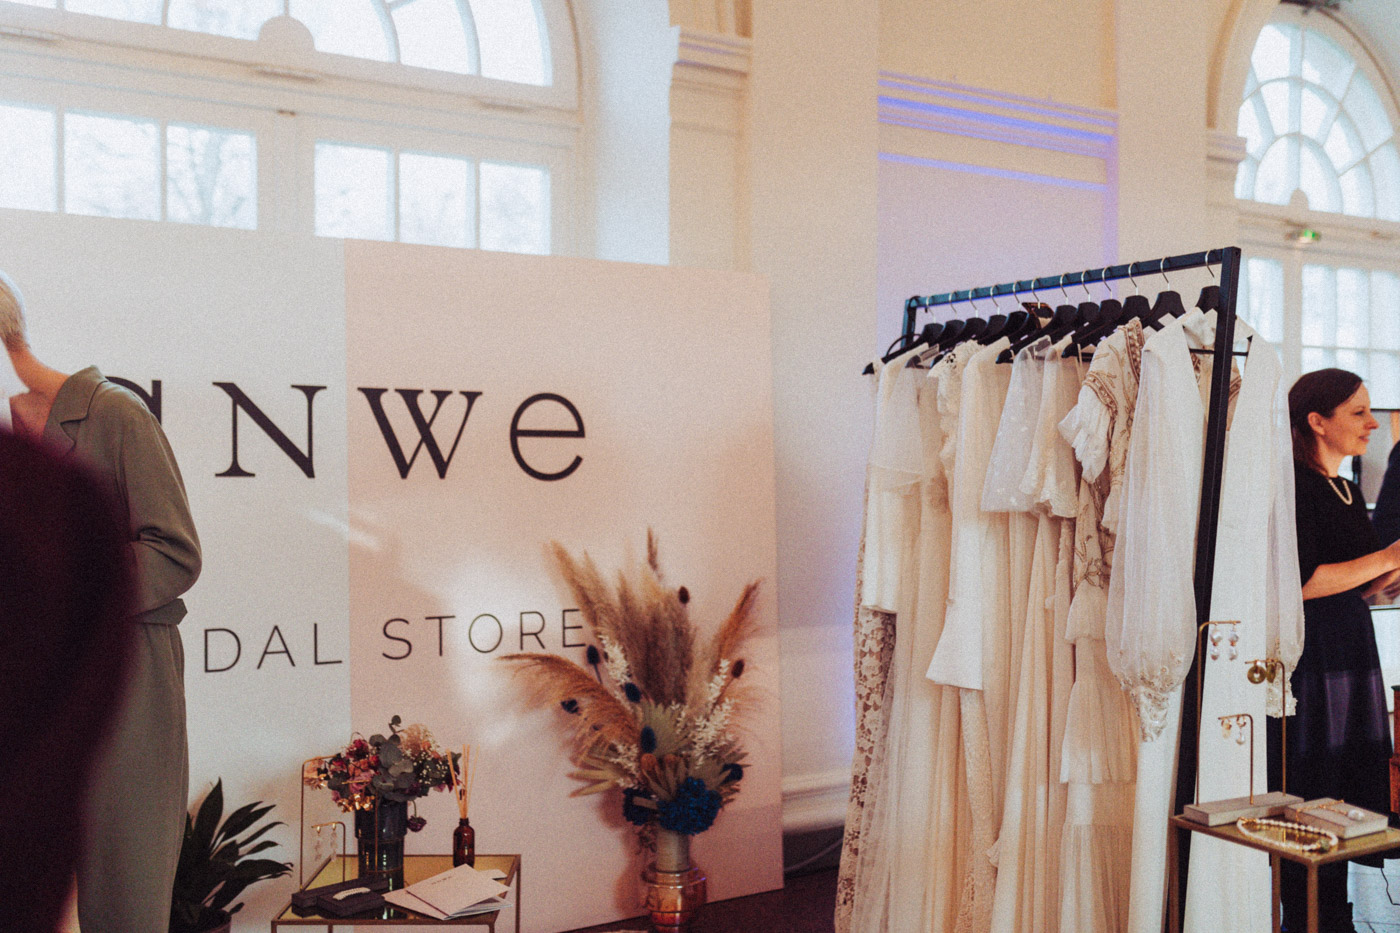 Anwe Bridal Store Hamburg